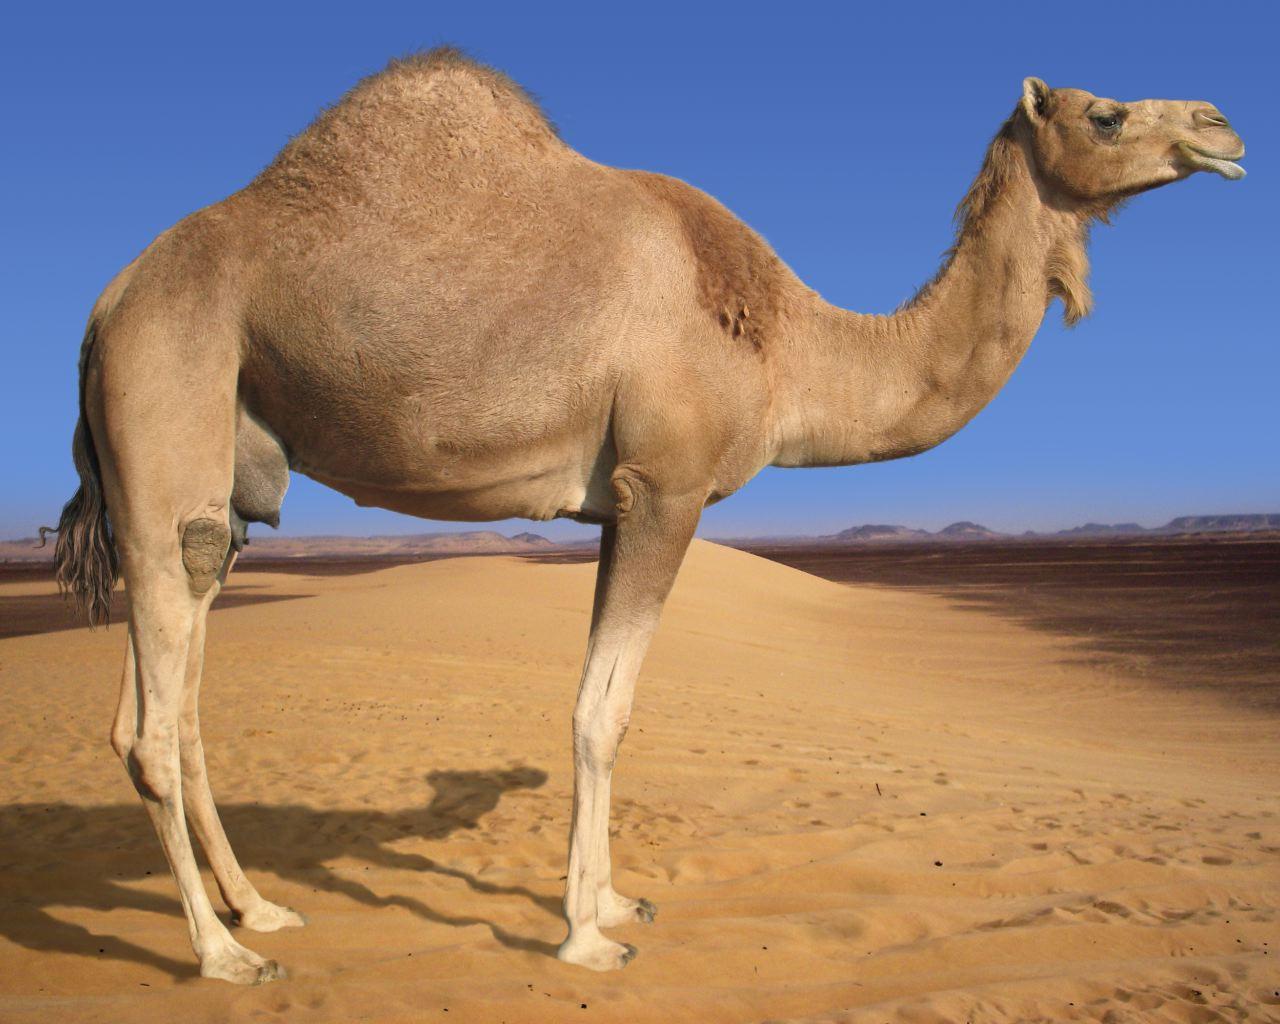 Arabian-Camel-1280x1024